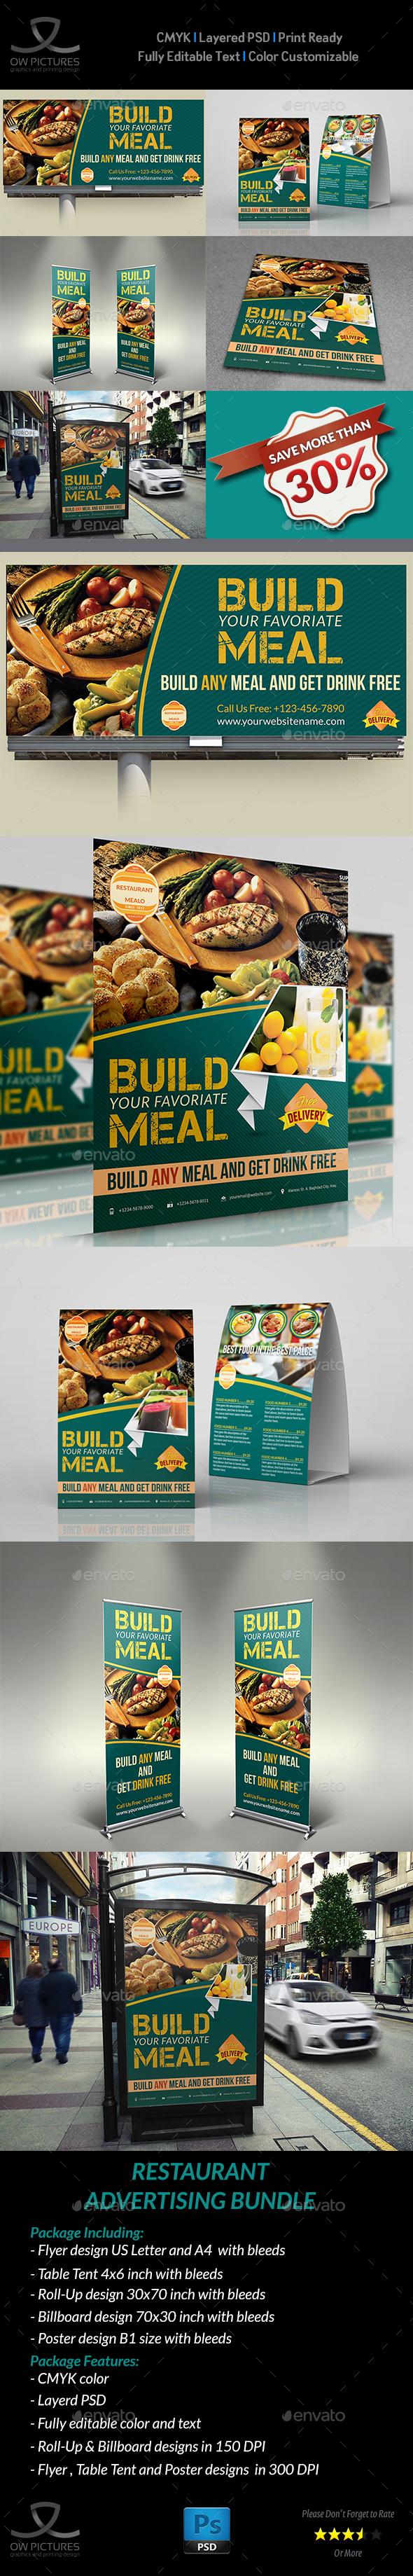 Restaurant Advertising Bundle